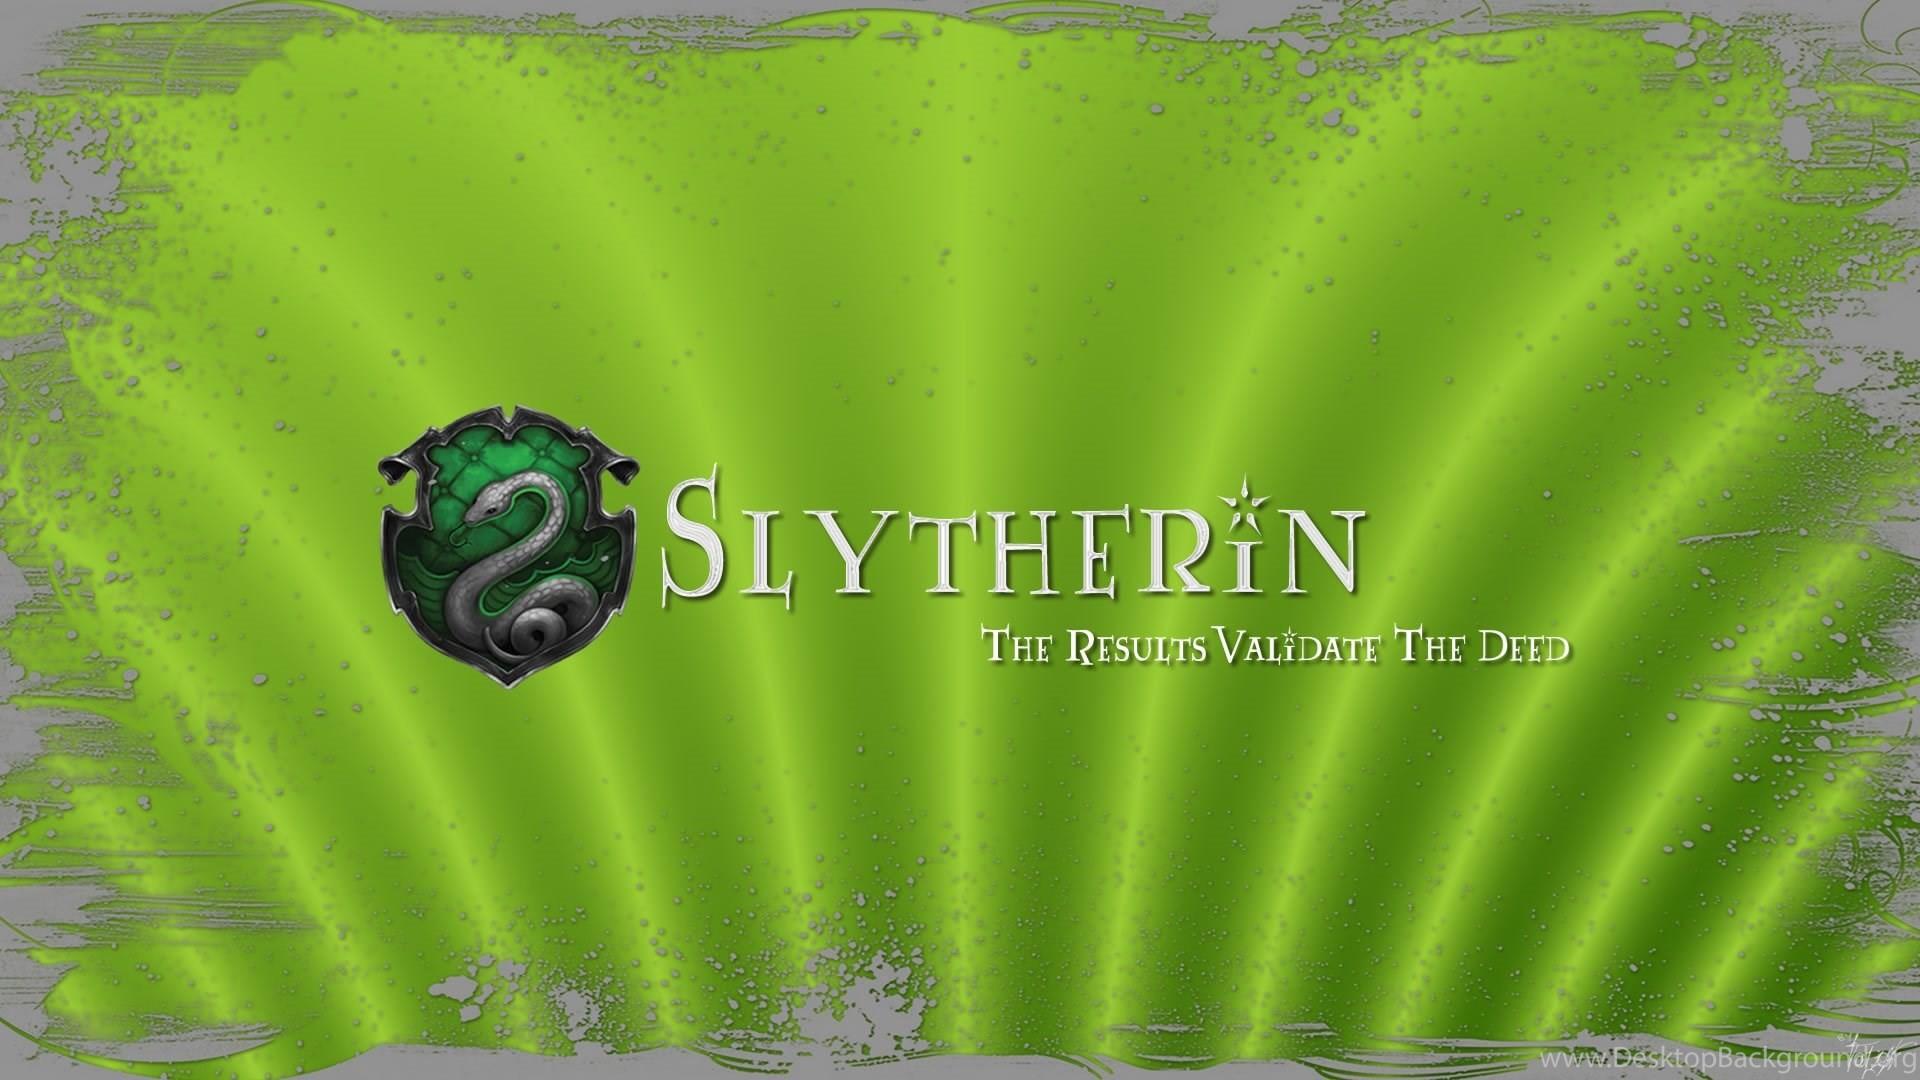 Argyle Iphone Wallpaper Slytherin Background 183 ①